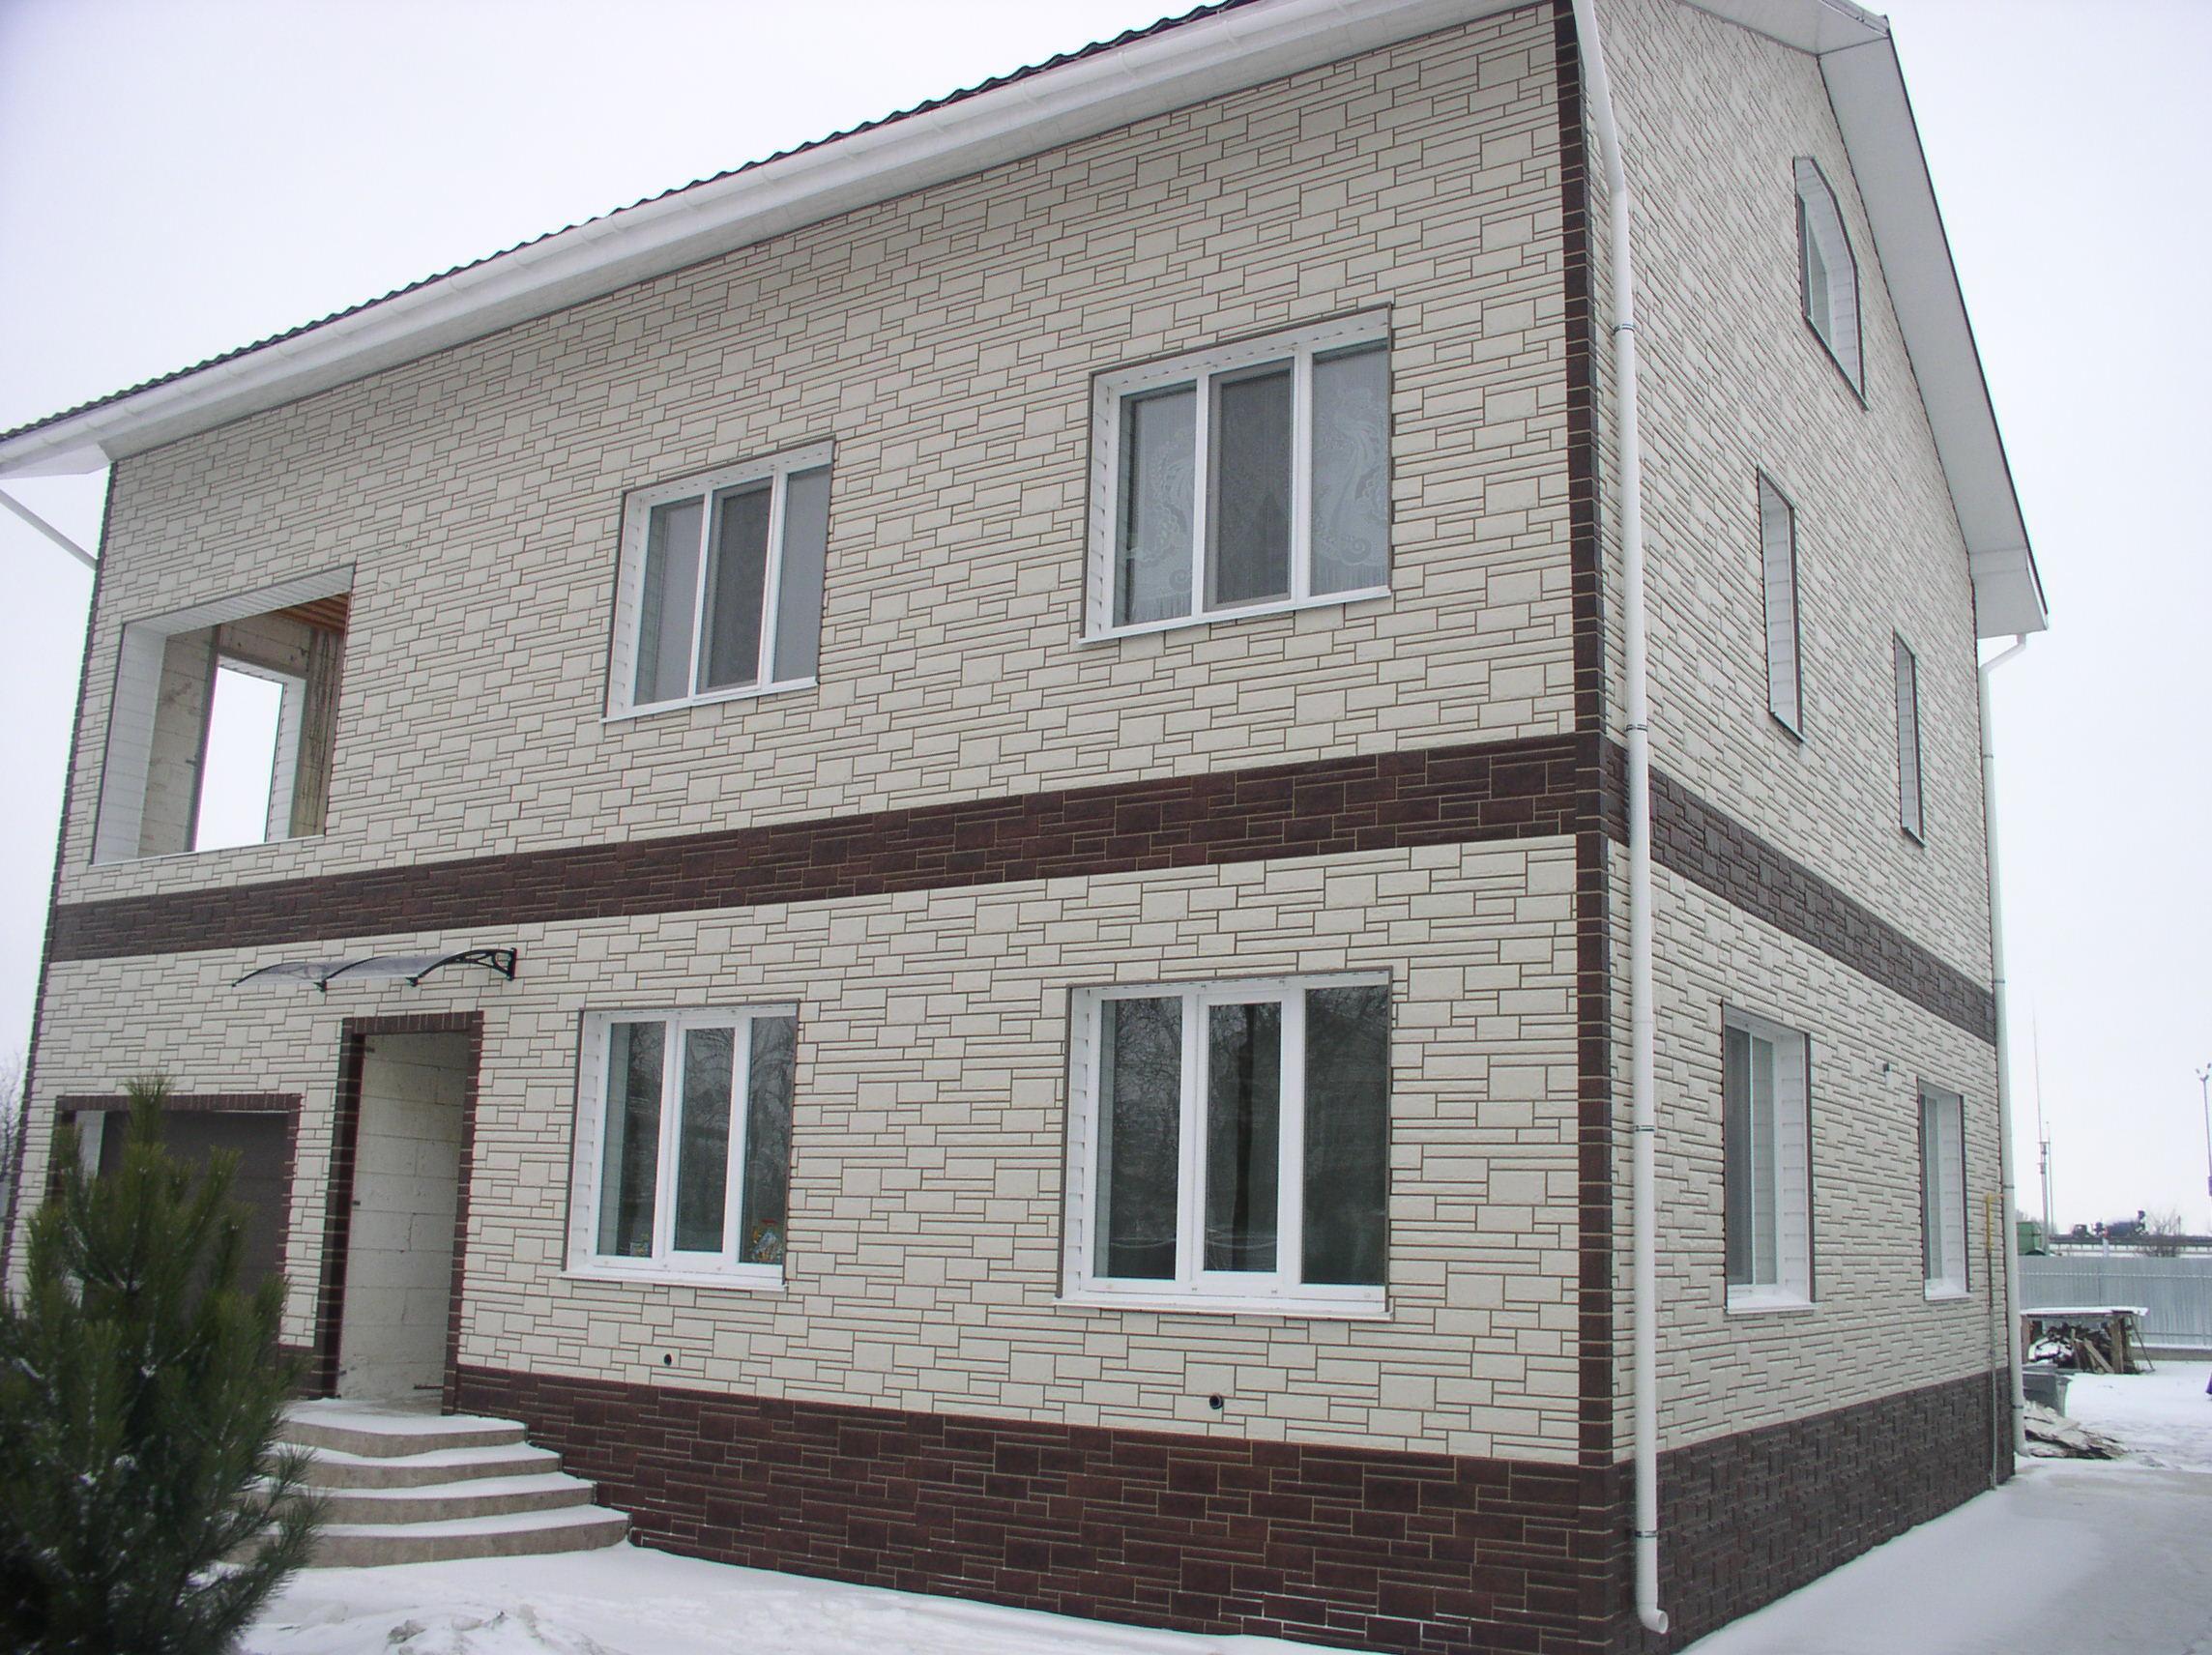 Облицовка фасада сайдингом